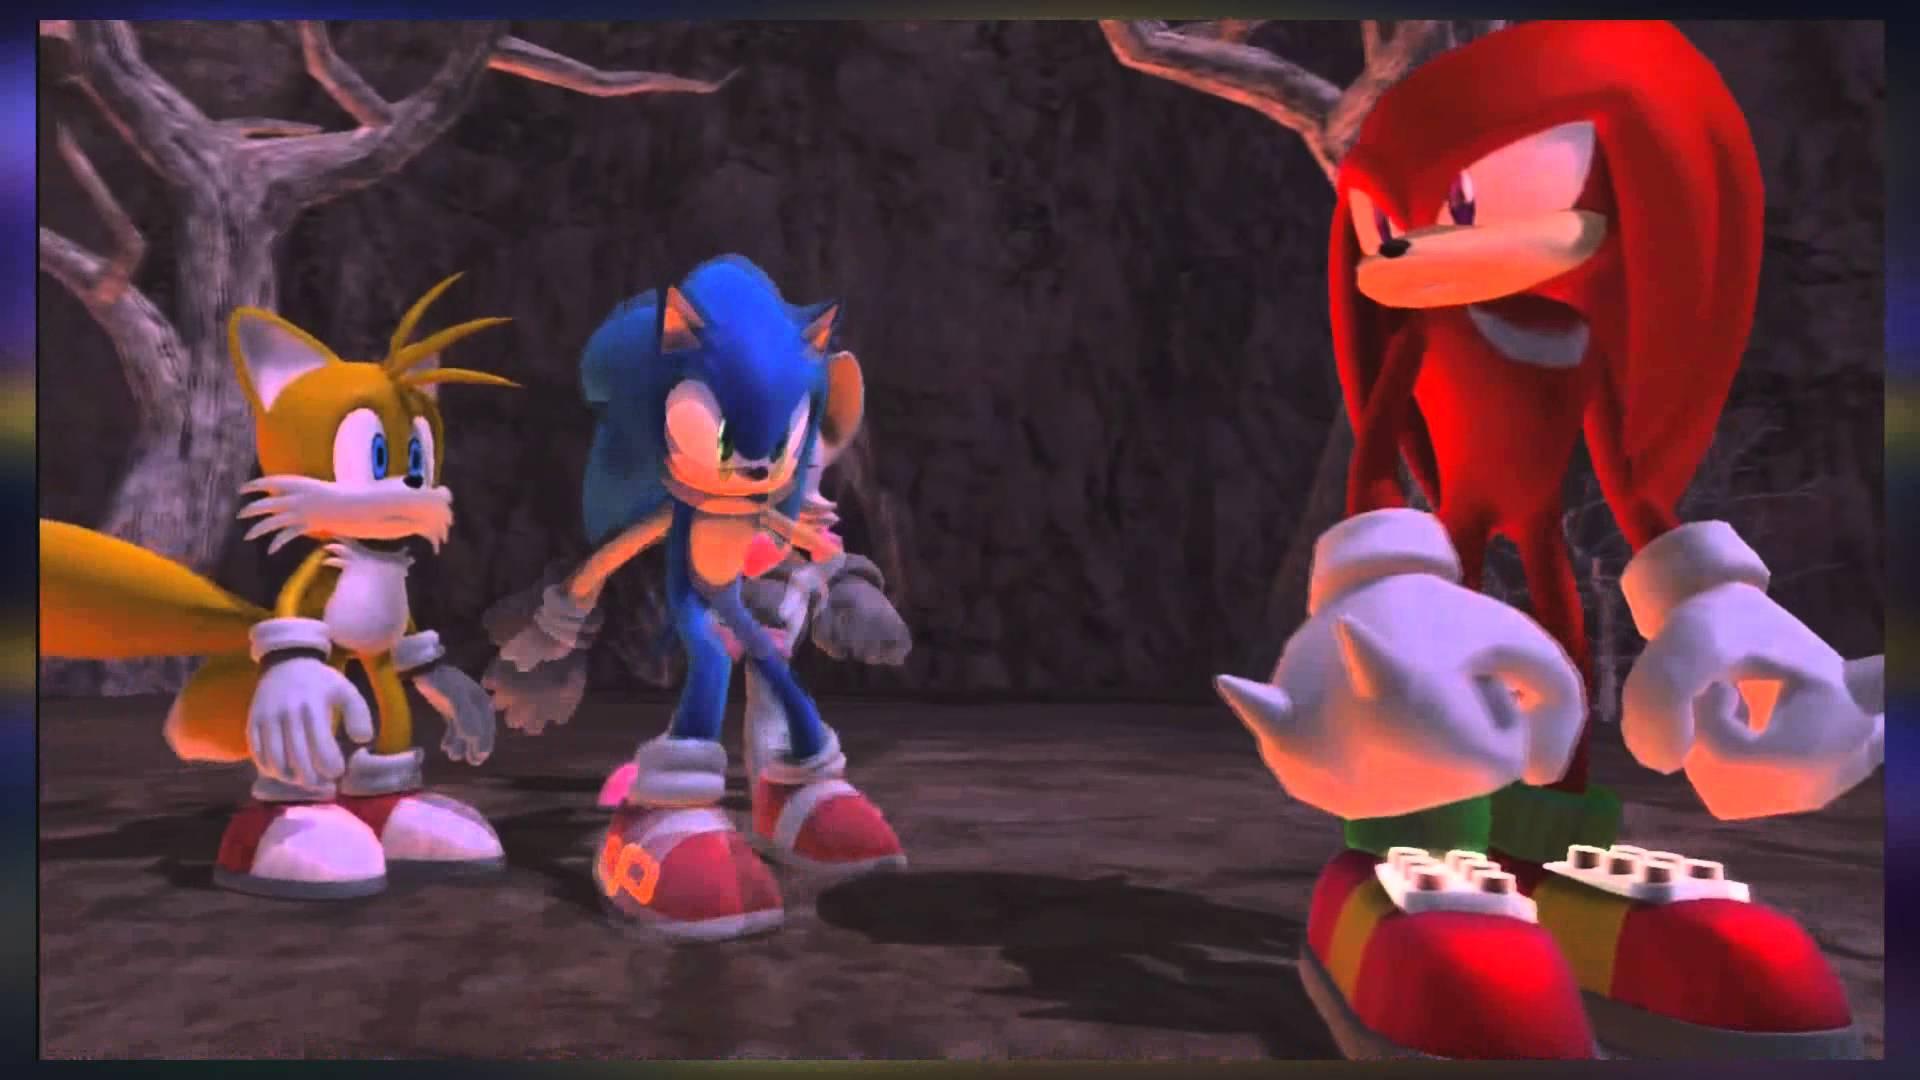 Most Viewed Sonic Knuckels Sonic The Hedgehog Wallpapers 4k Wallpapers